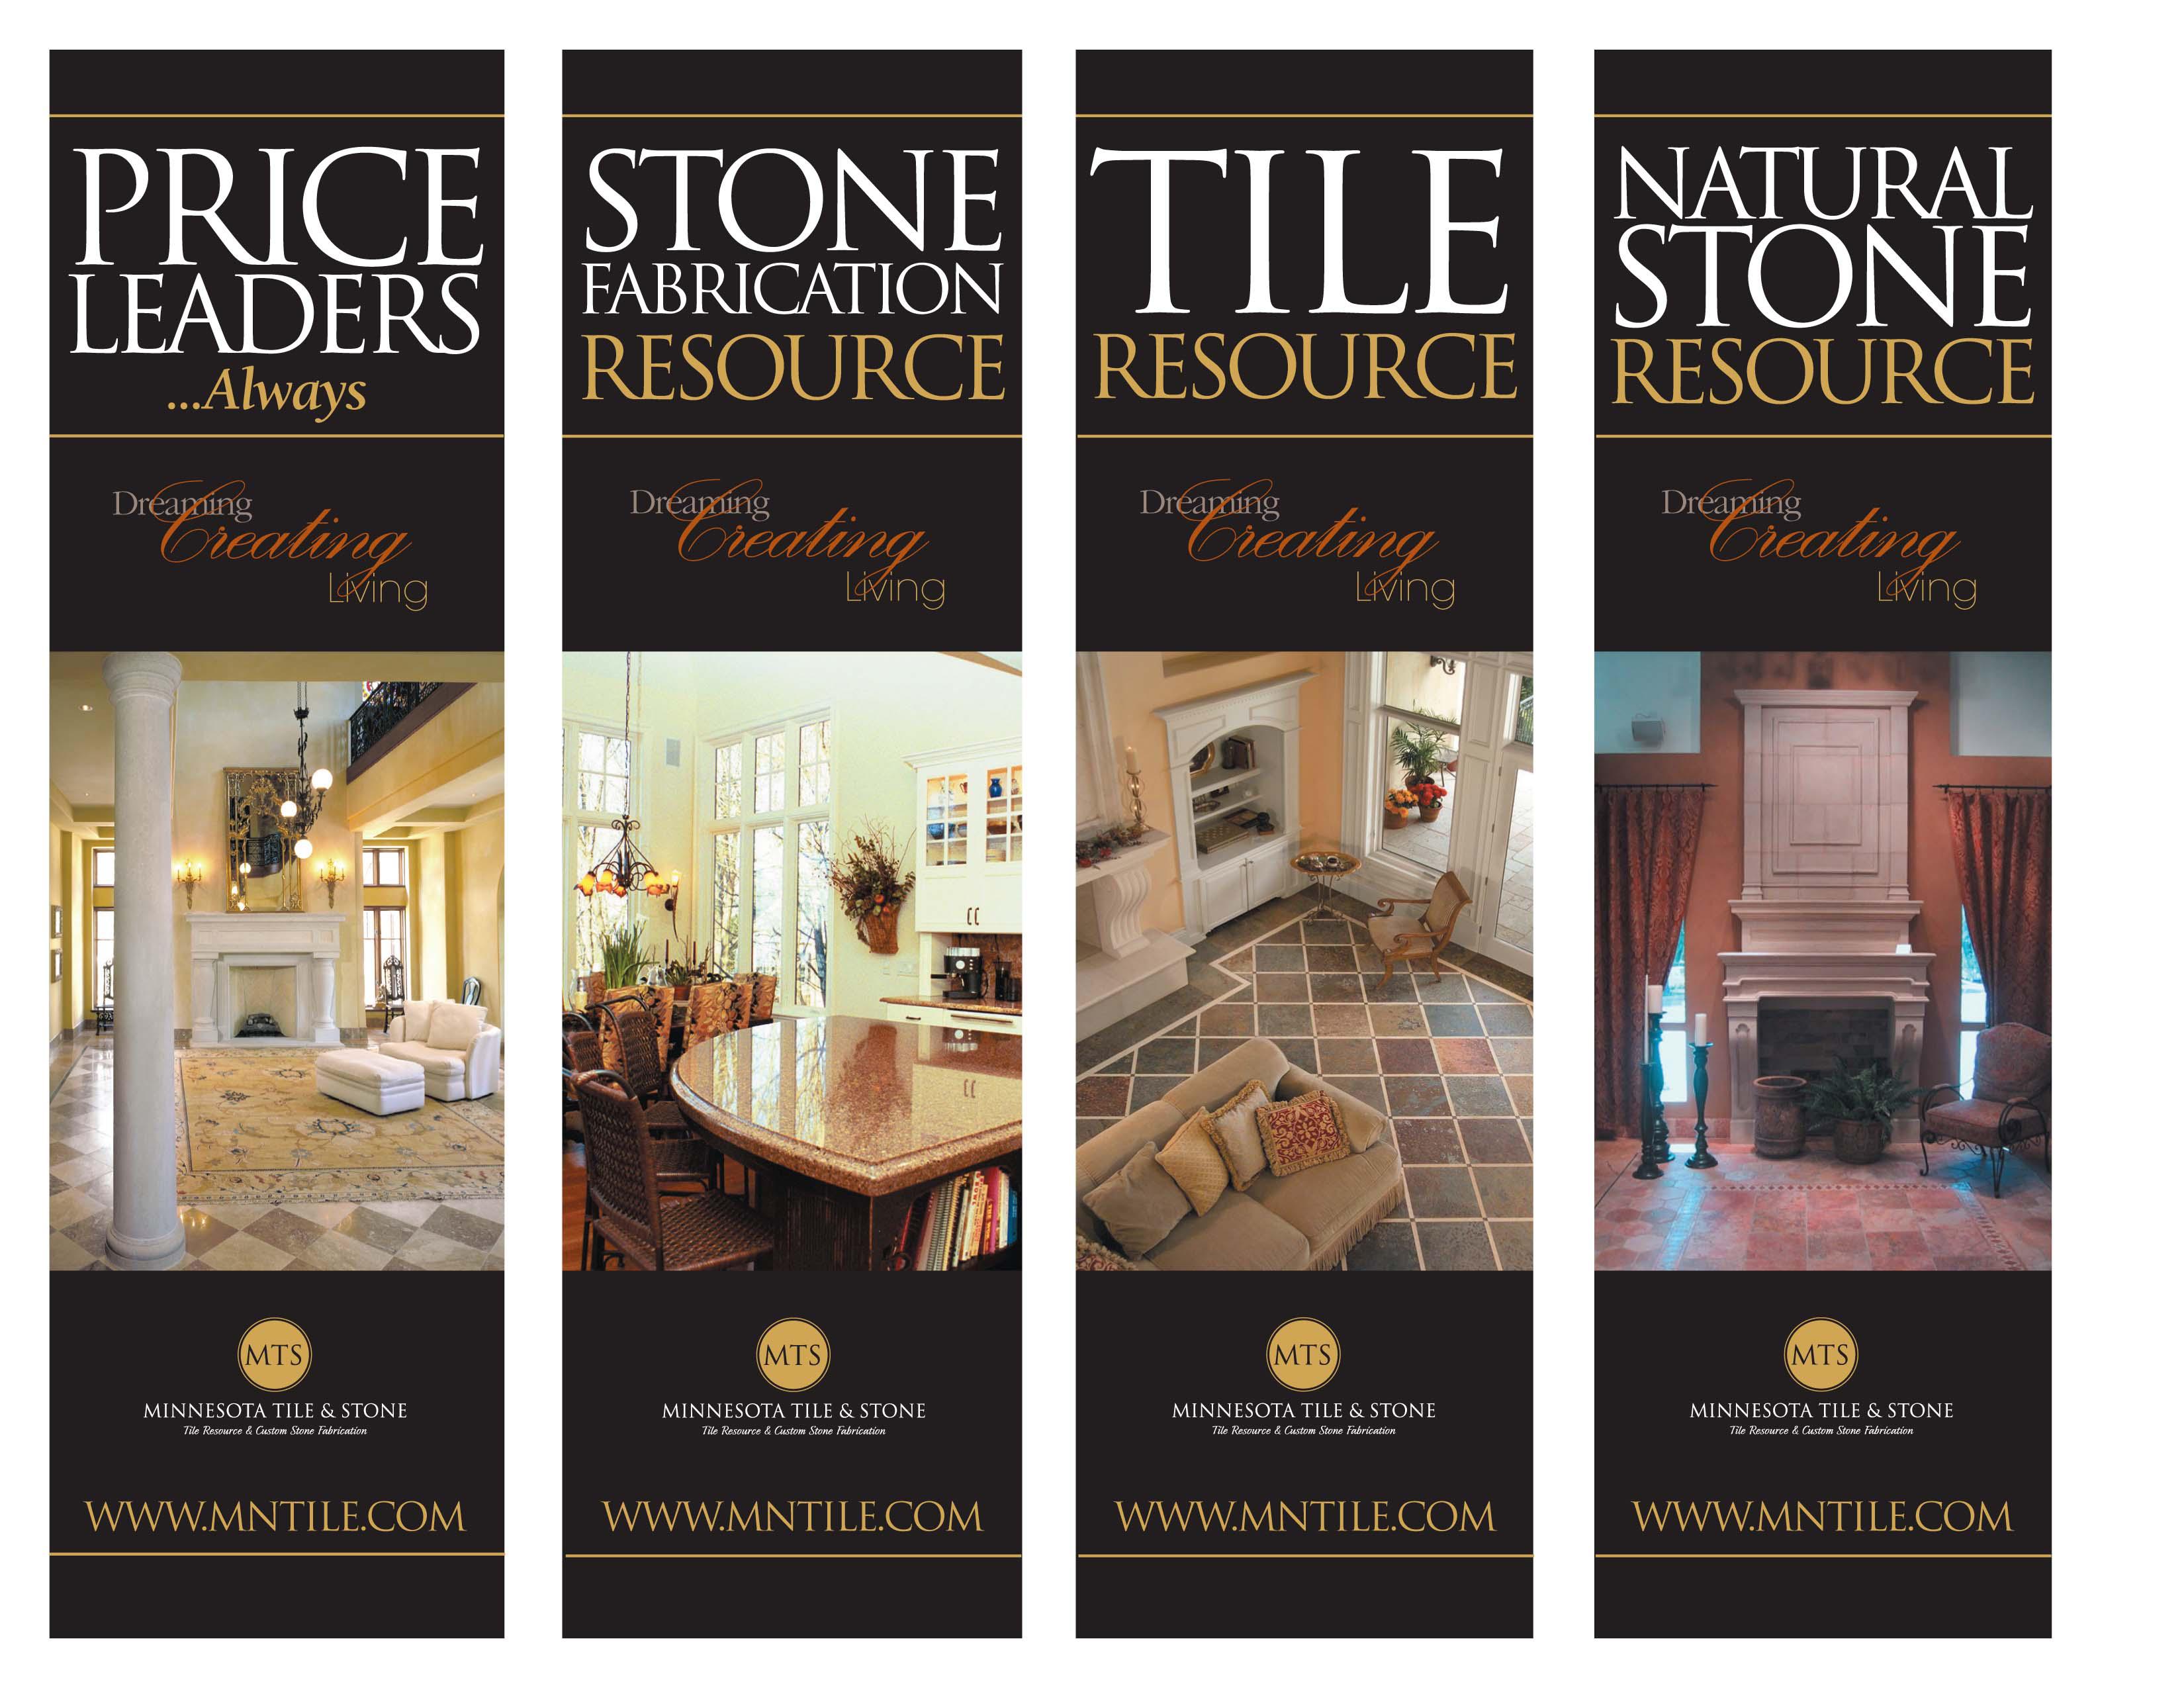 Minnesota Tile & Stone Banners.jpg